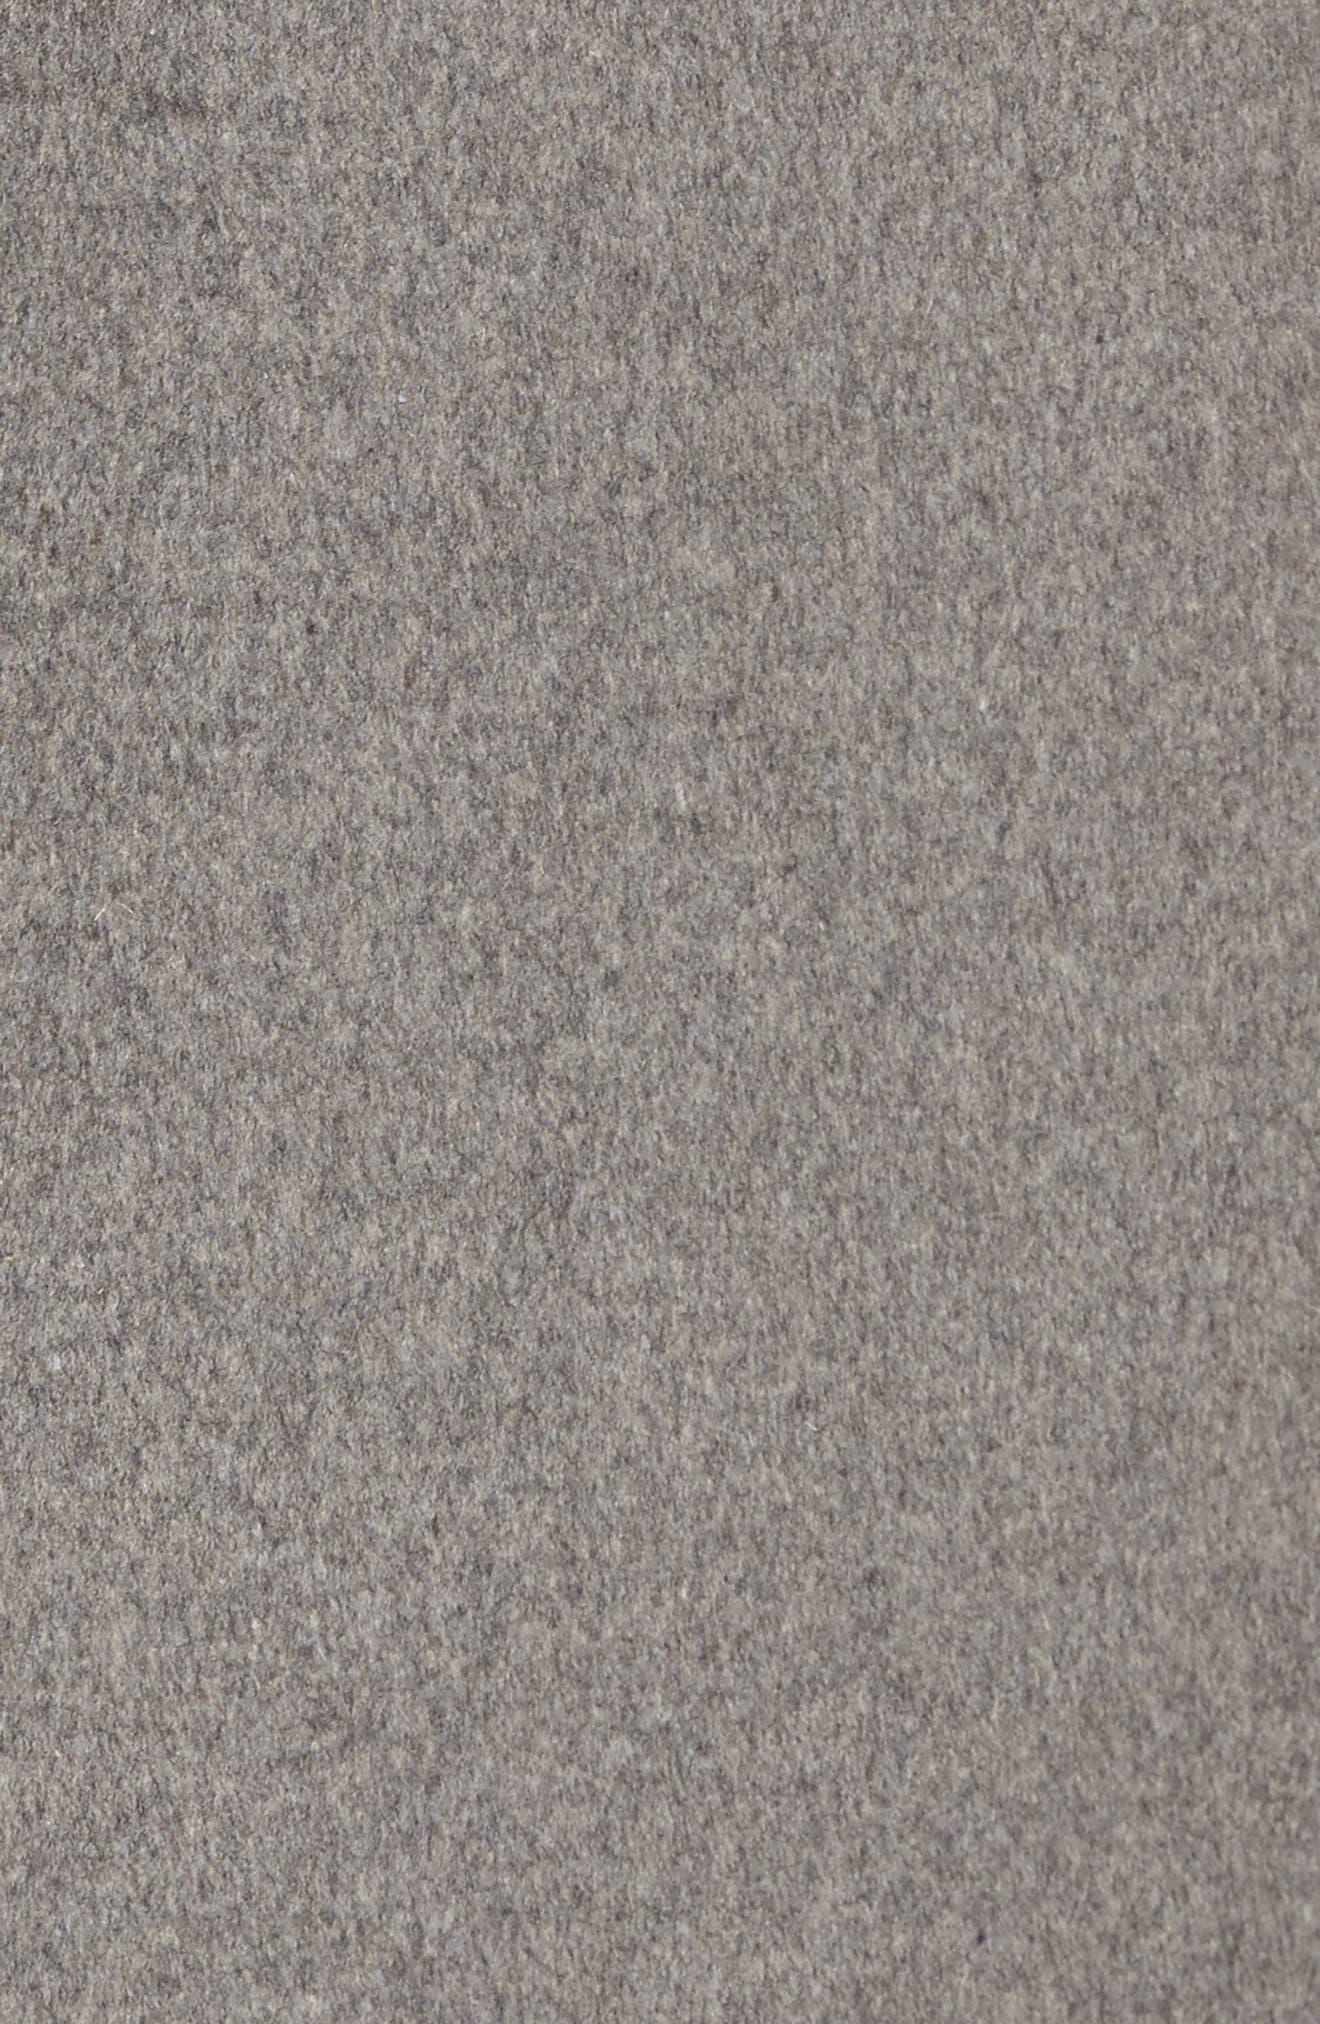 DKNY Lavish Wool Blend Coat,                             Alternate thumbnail 12, color,